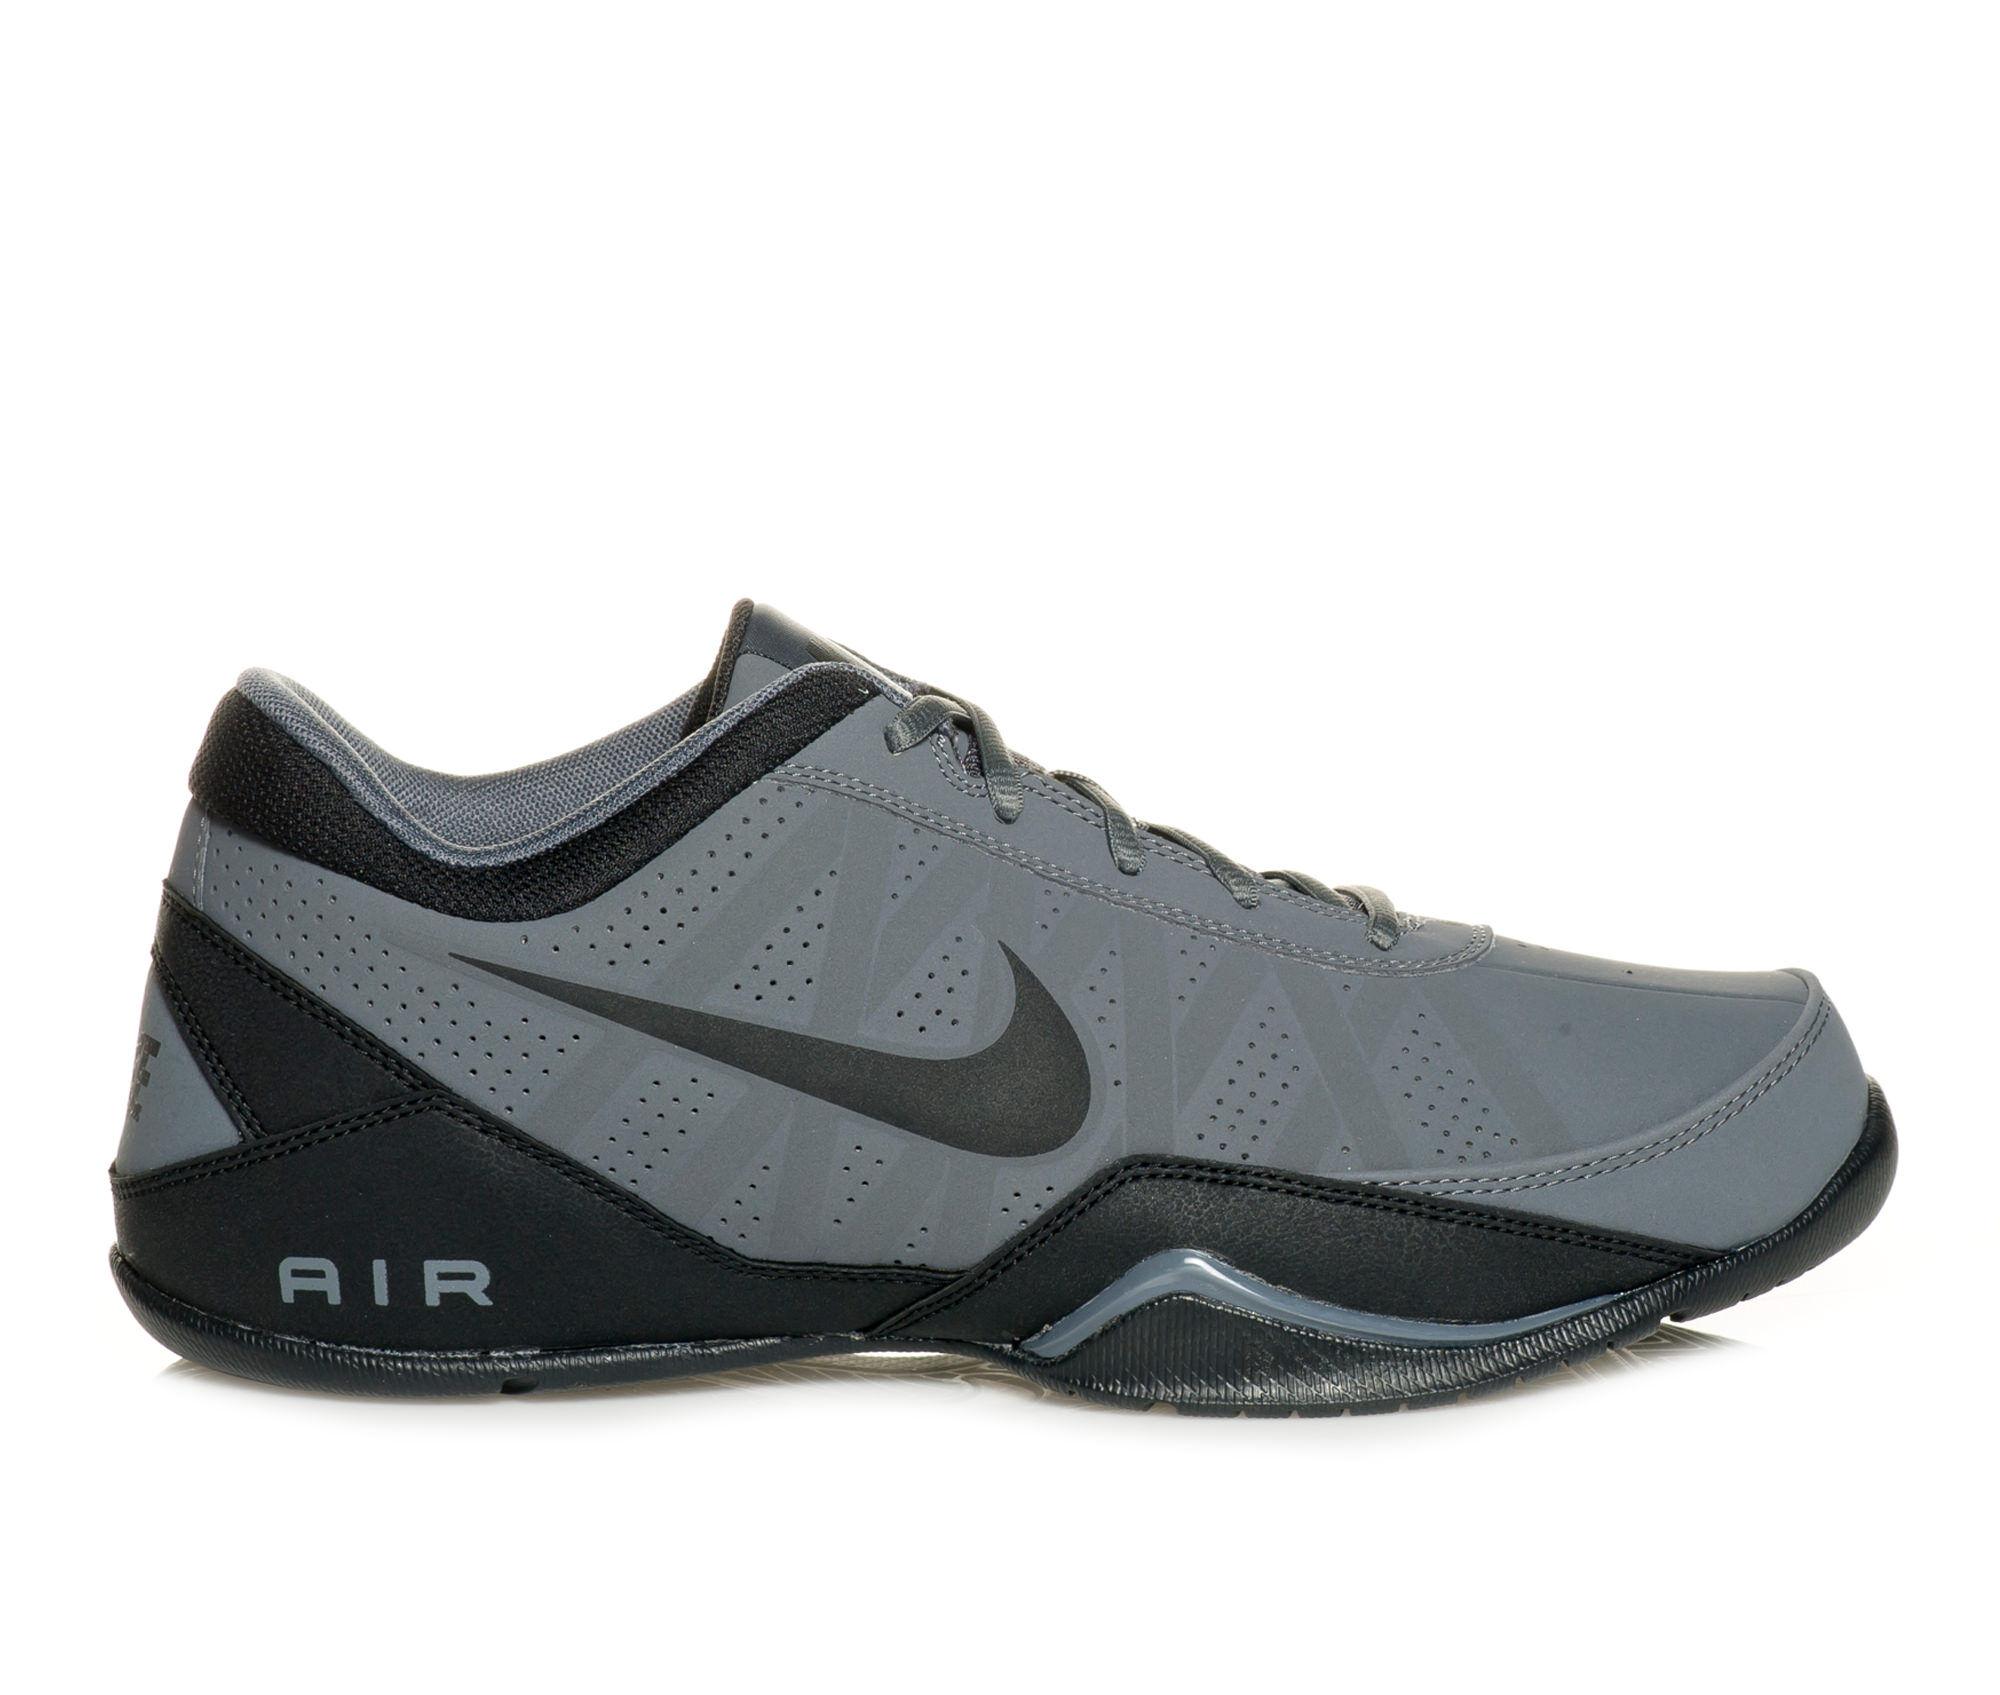 uk shoes_kd1731